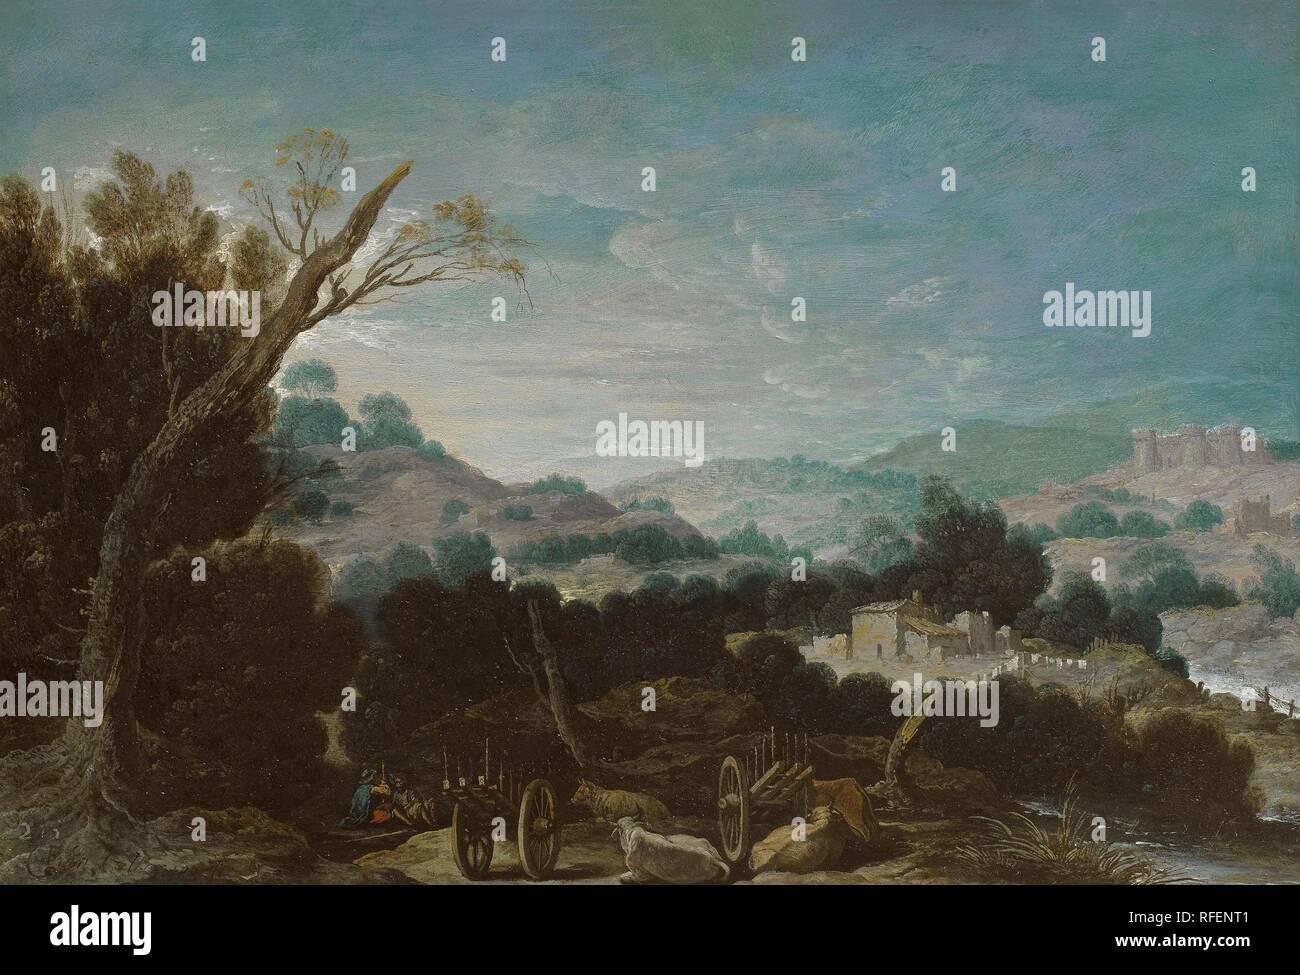 COLLANTES, FRANCISCO, Landscape with Shepherds.jpg - RFENT1 - Stock Image